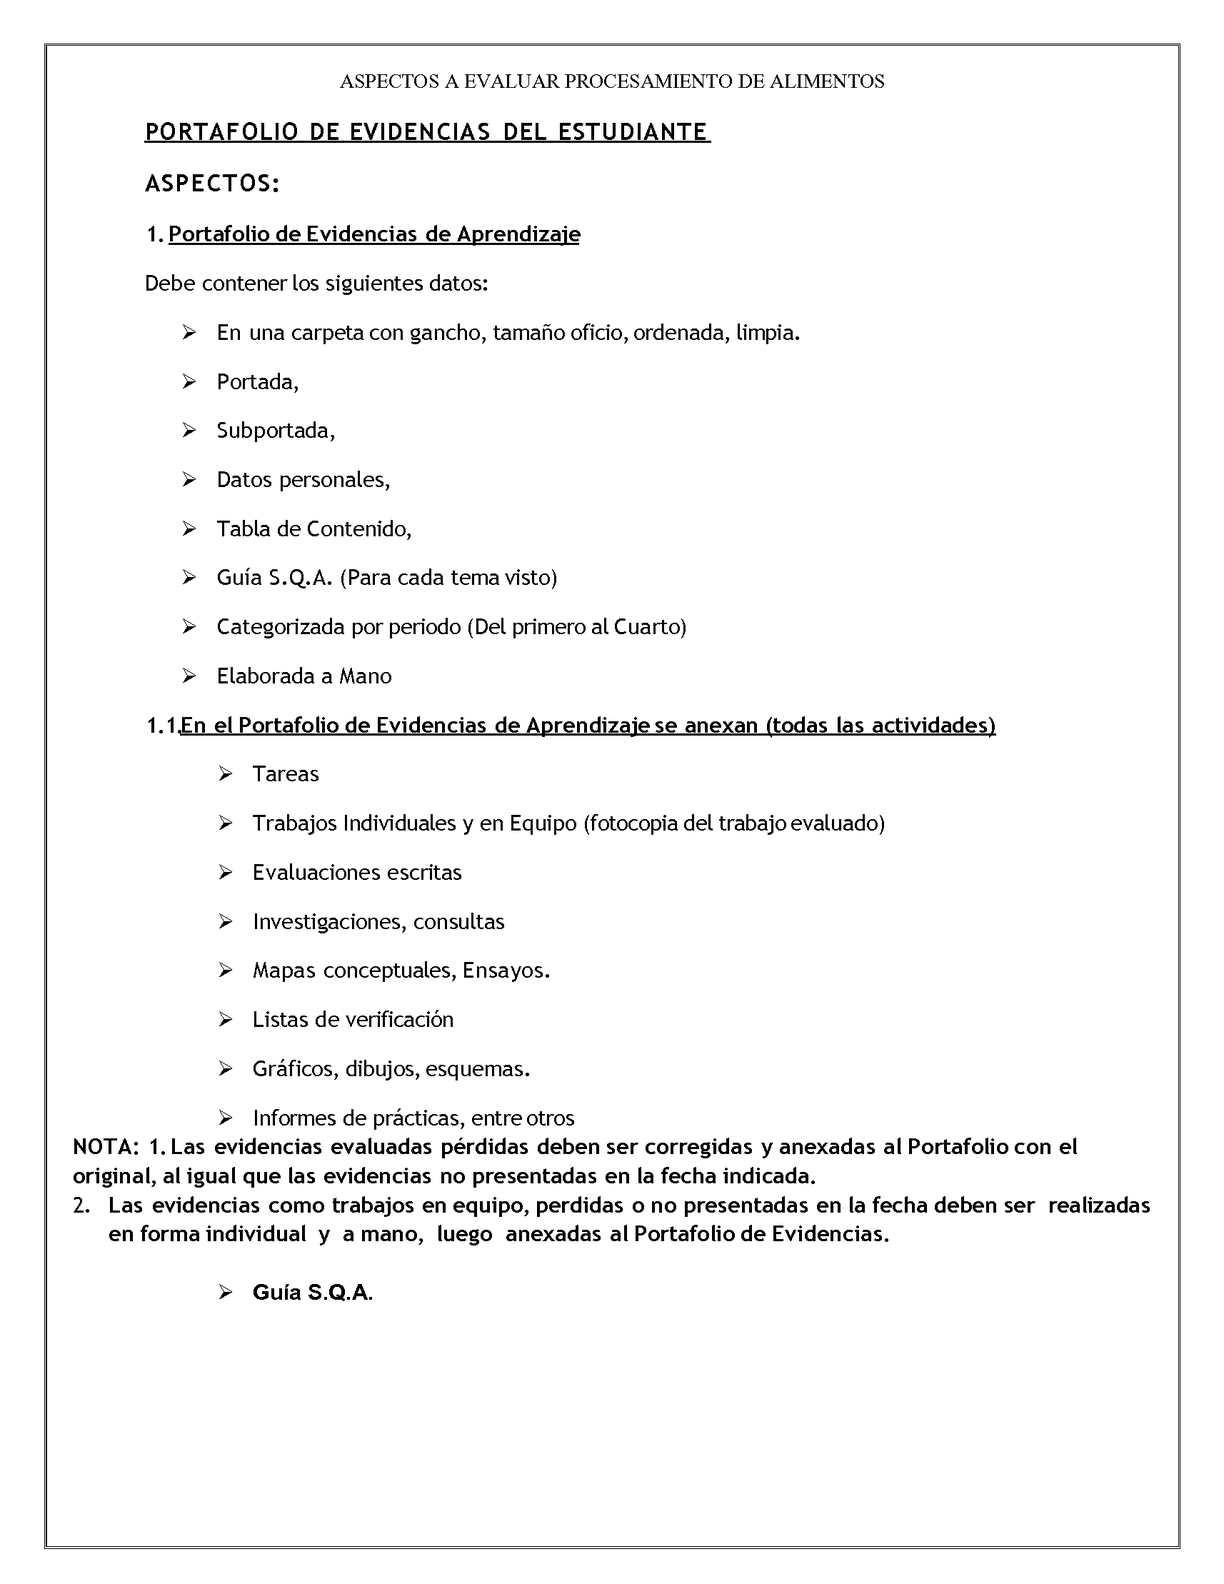 Calaméo - Portafolio Evidencias, Informe Practicas, Lista chequeo y ...